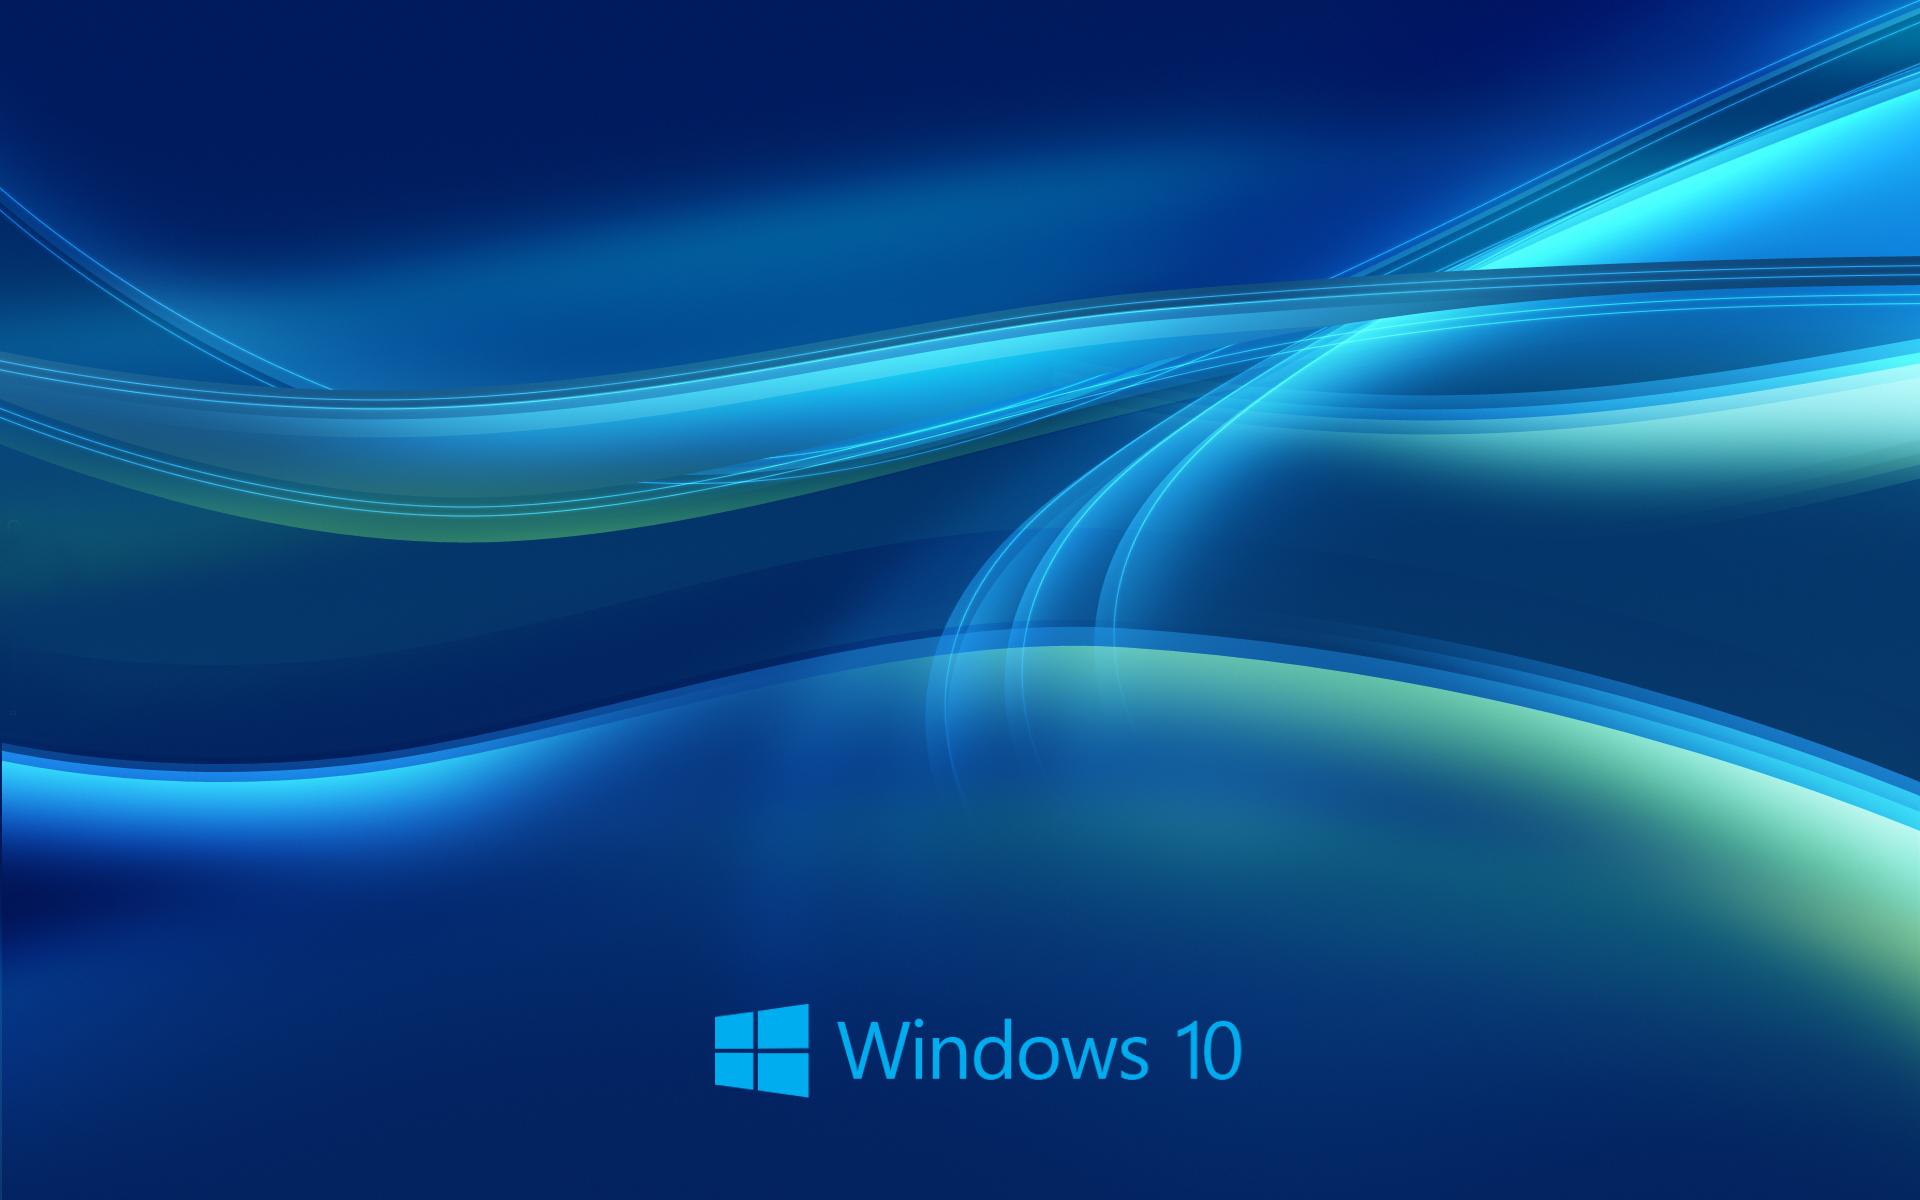 Best Windows 10 Wallpapers HD 1080p | Tech 63